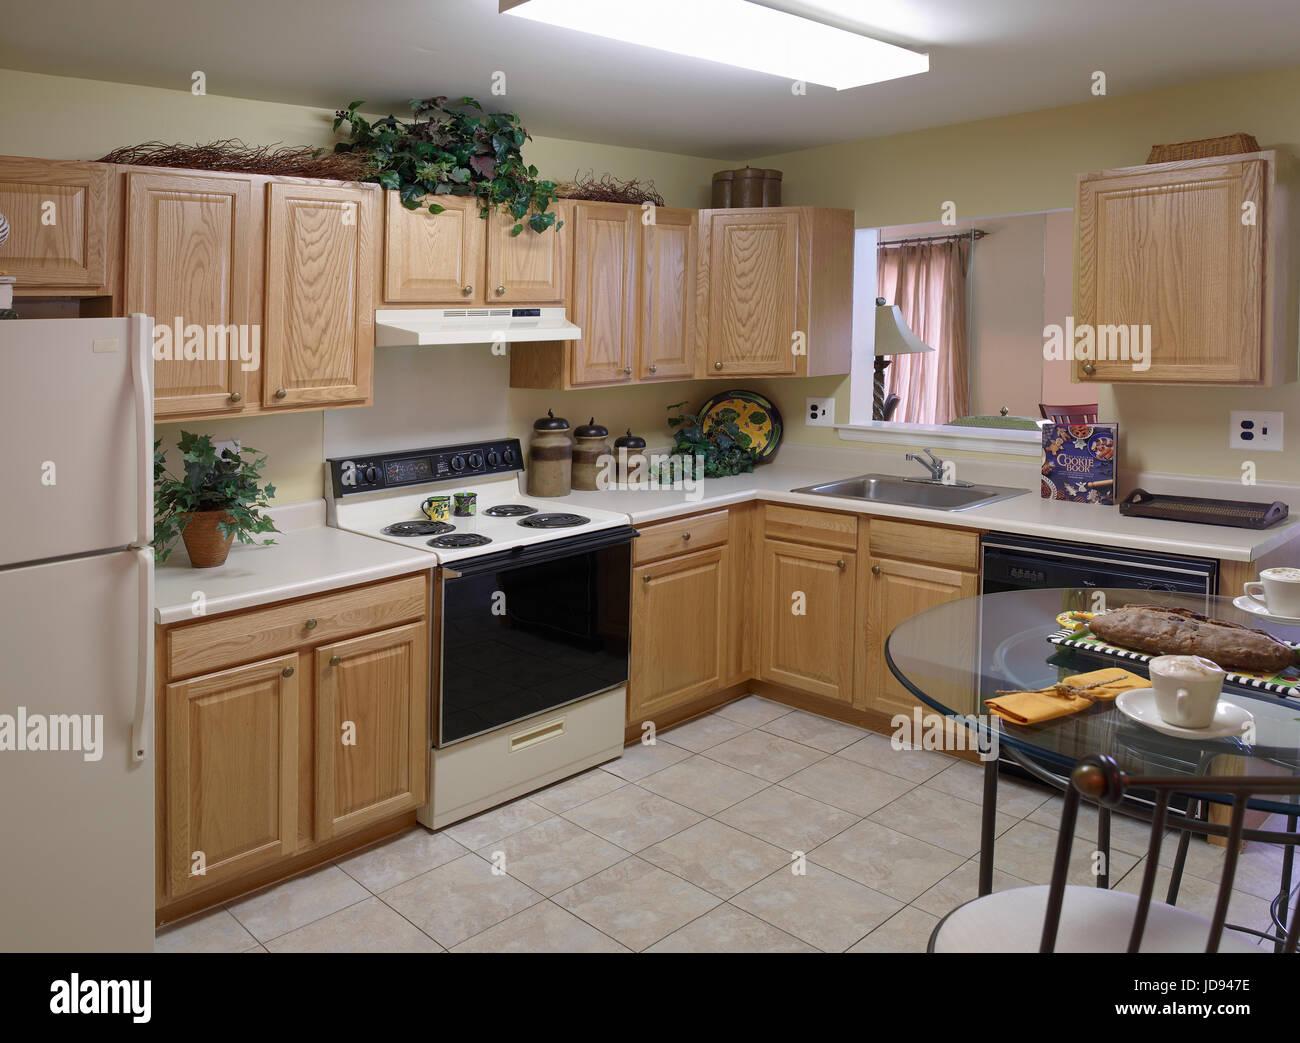 Kitchen Interior - Stock Image